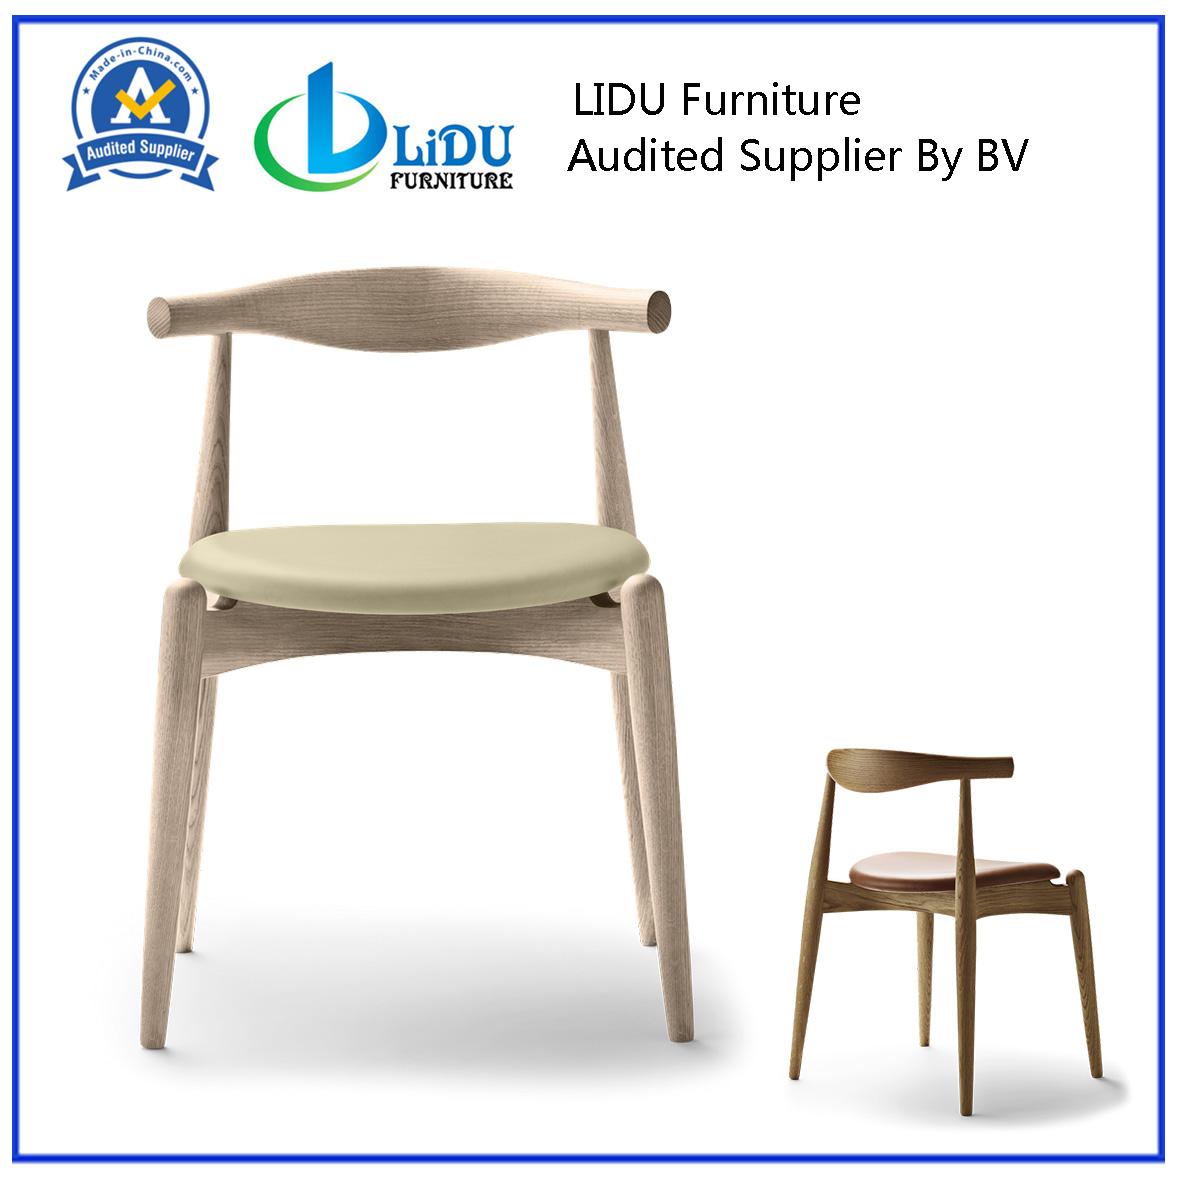 Astonishing Modern Dining Chair For Sale Dining Chair Wood Dining Chair Ncnpc Chair Design For Home Ncnpcorg